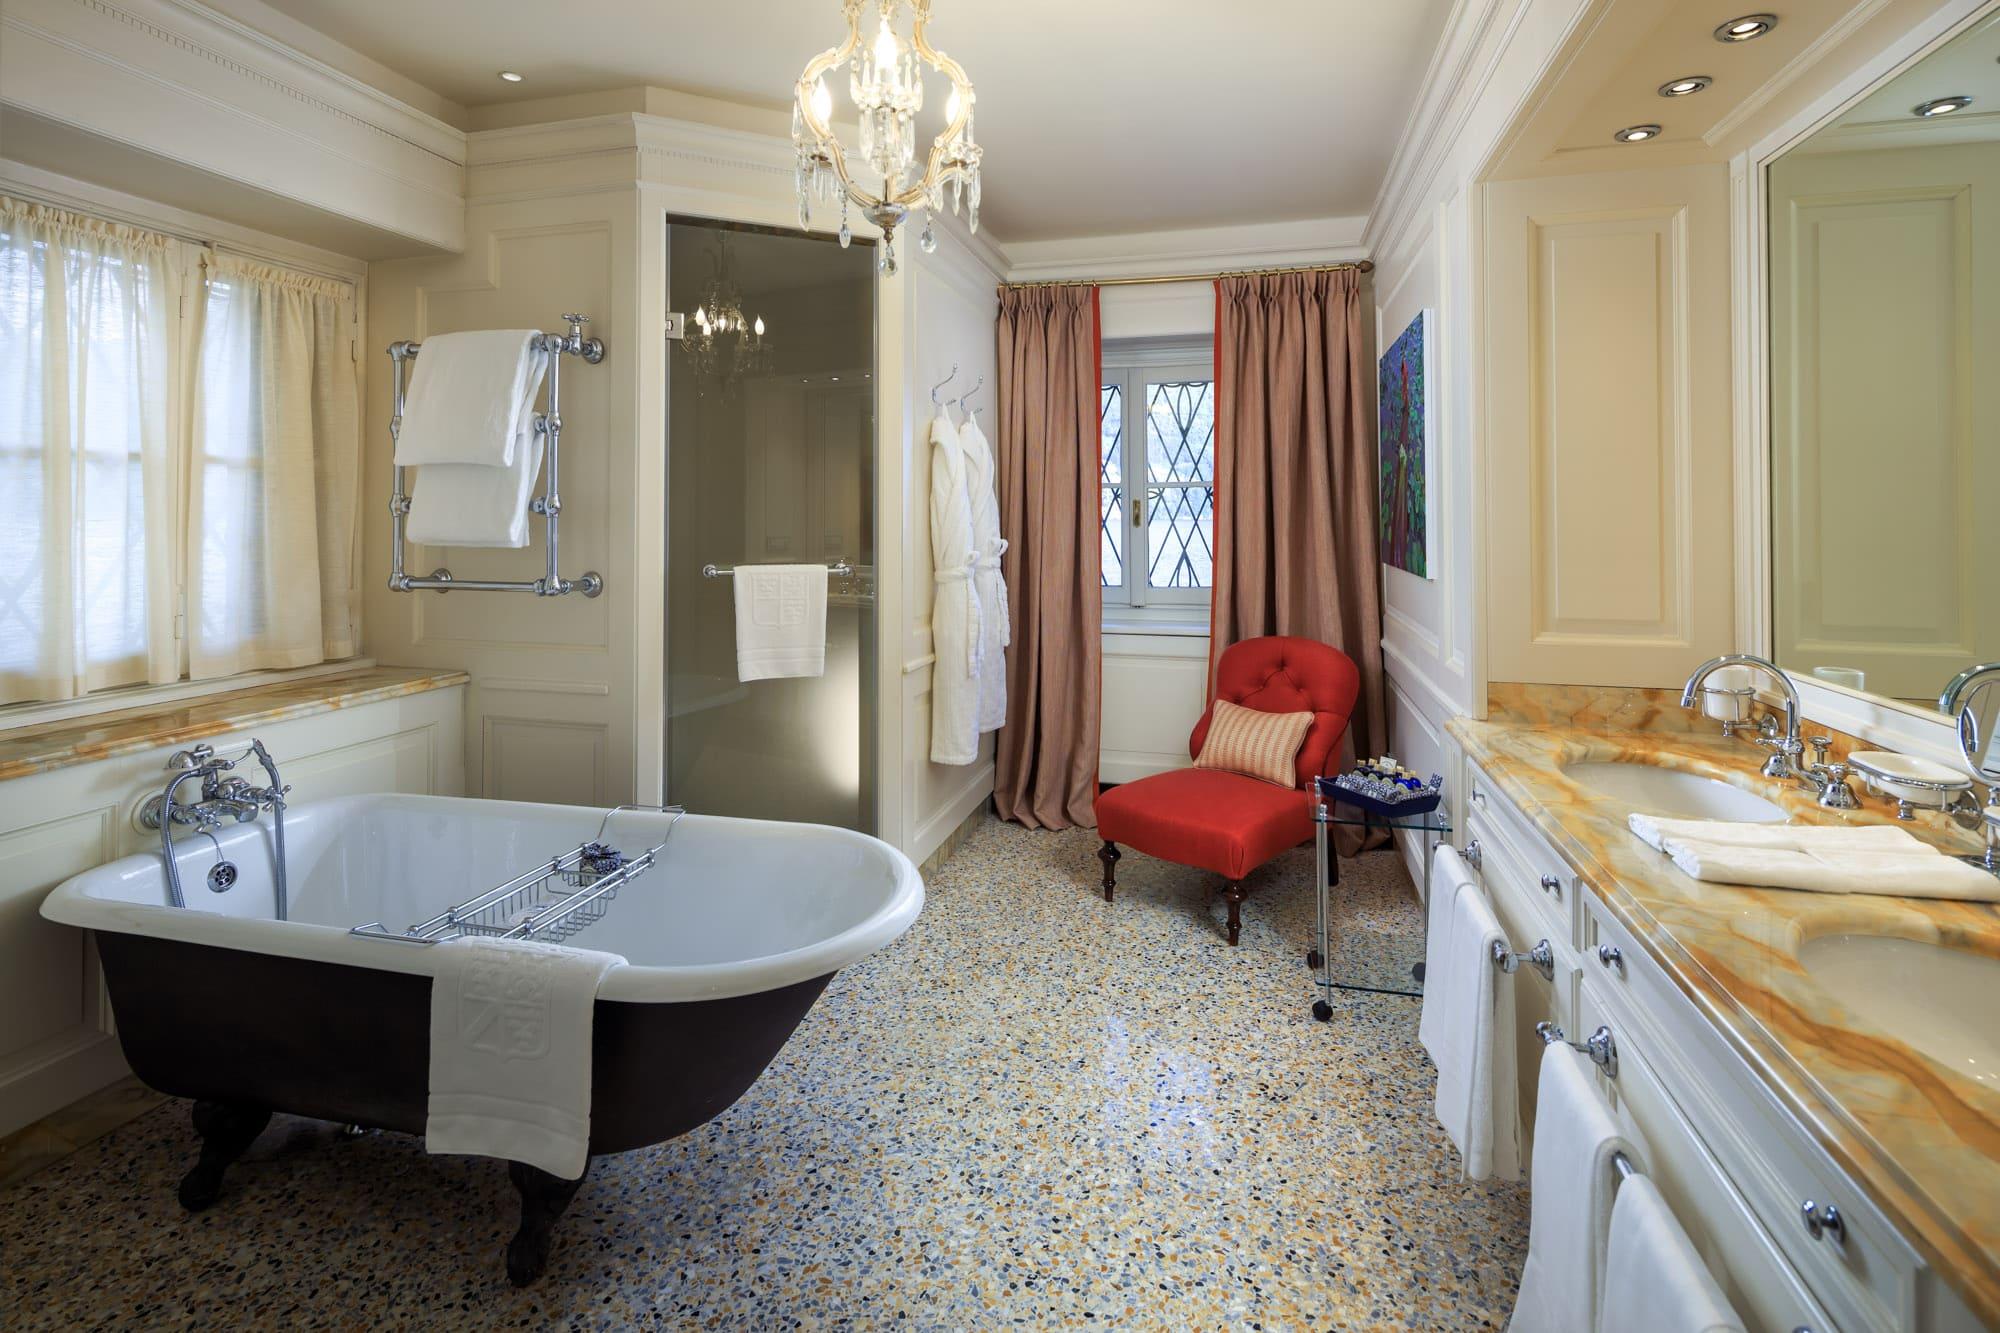 Villa Cima - Ground floor - Double Room, bathroom